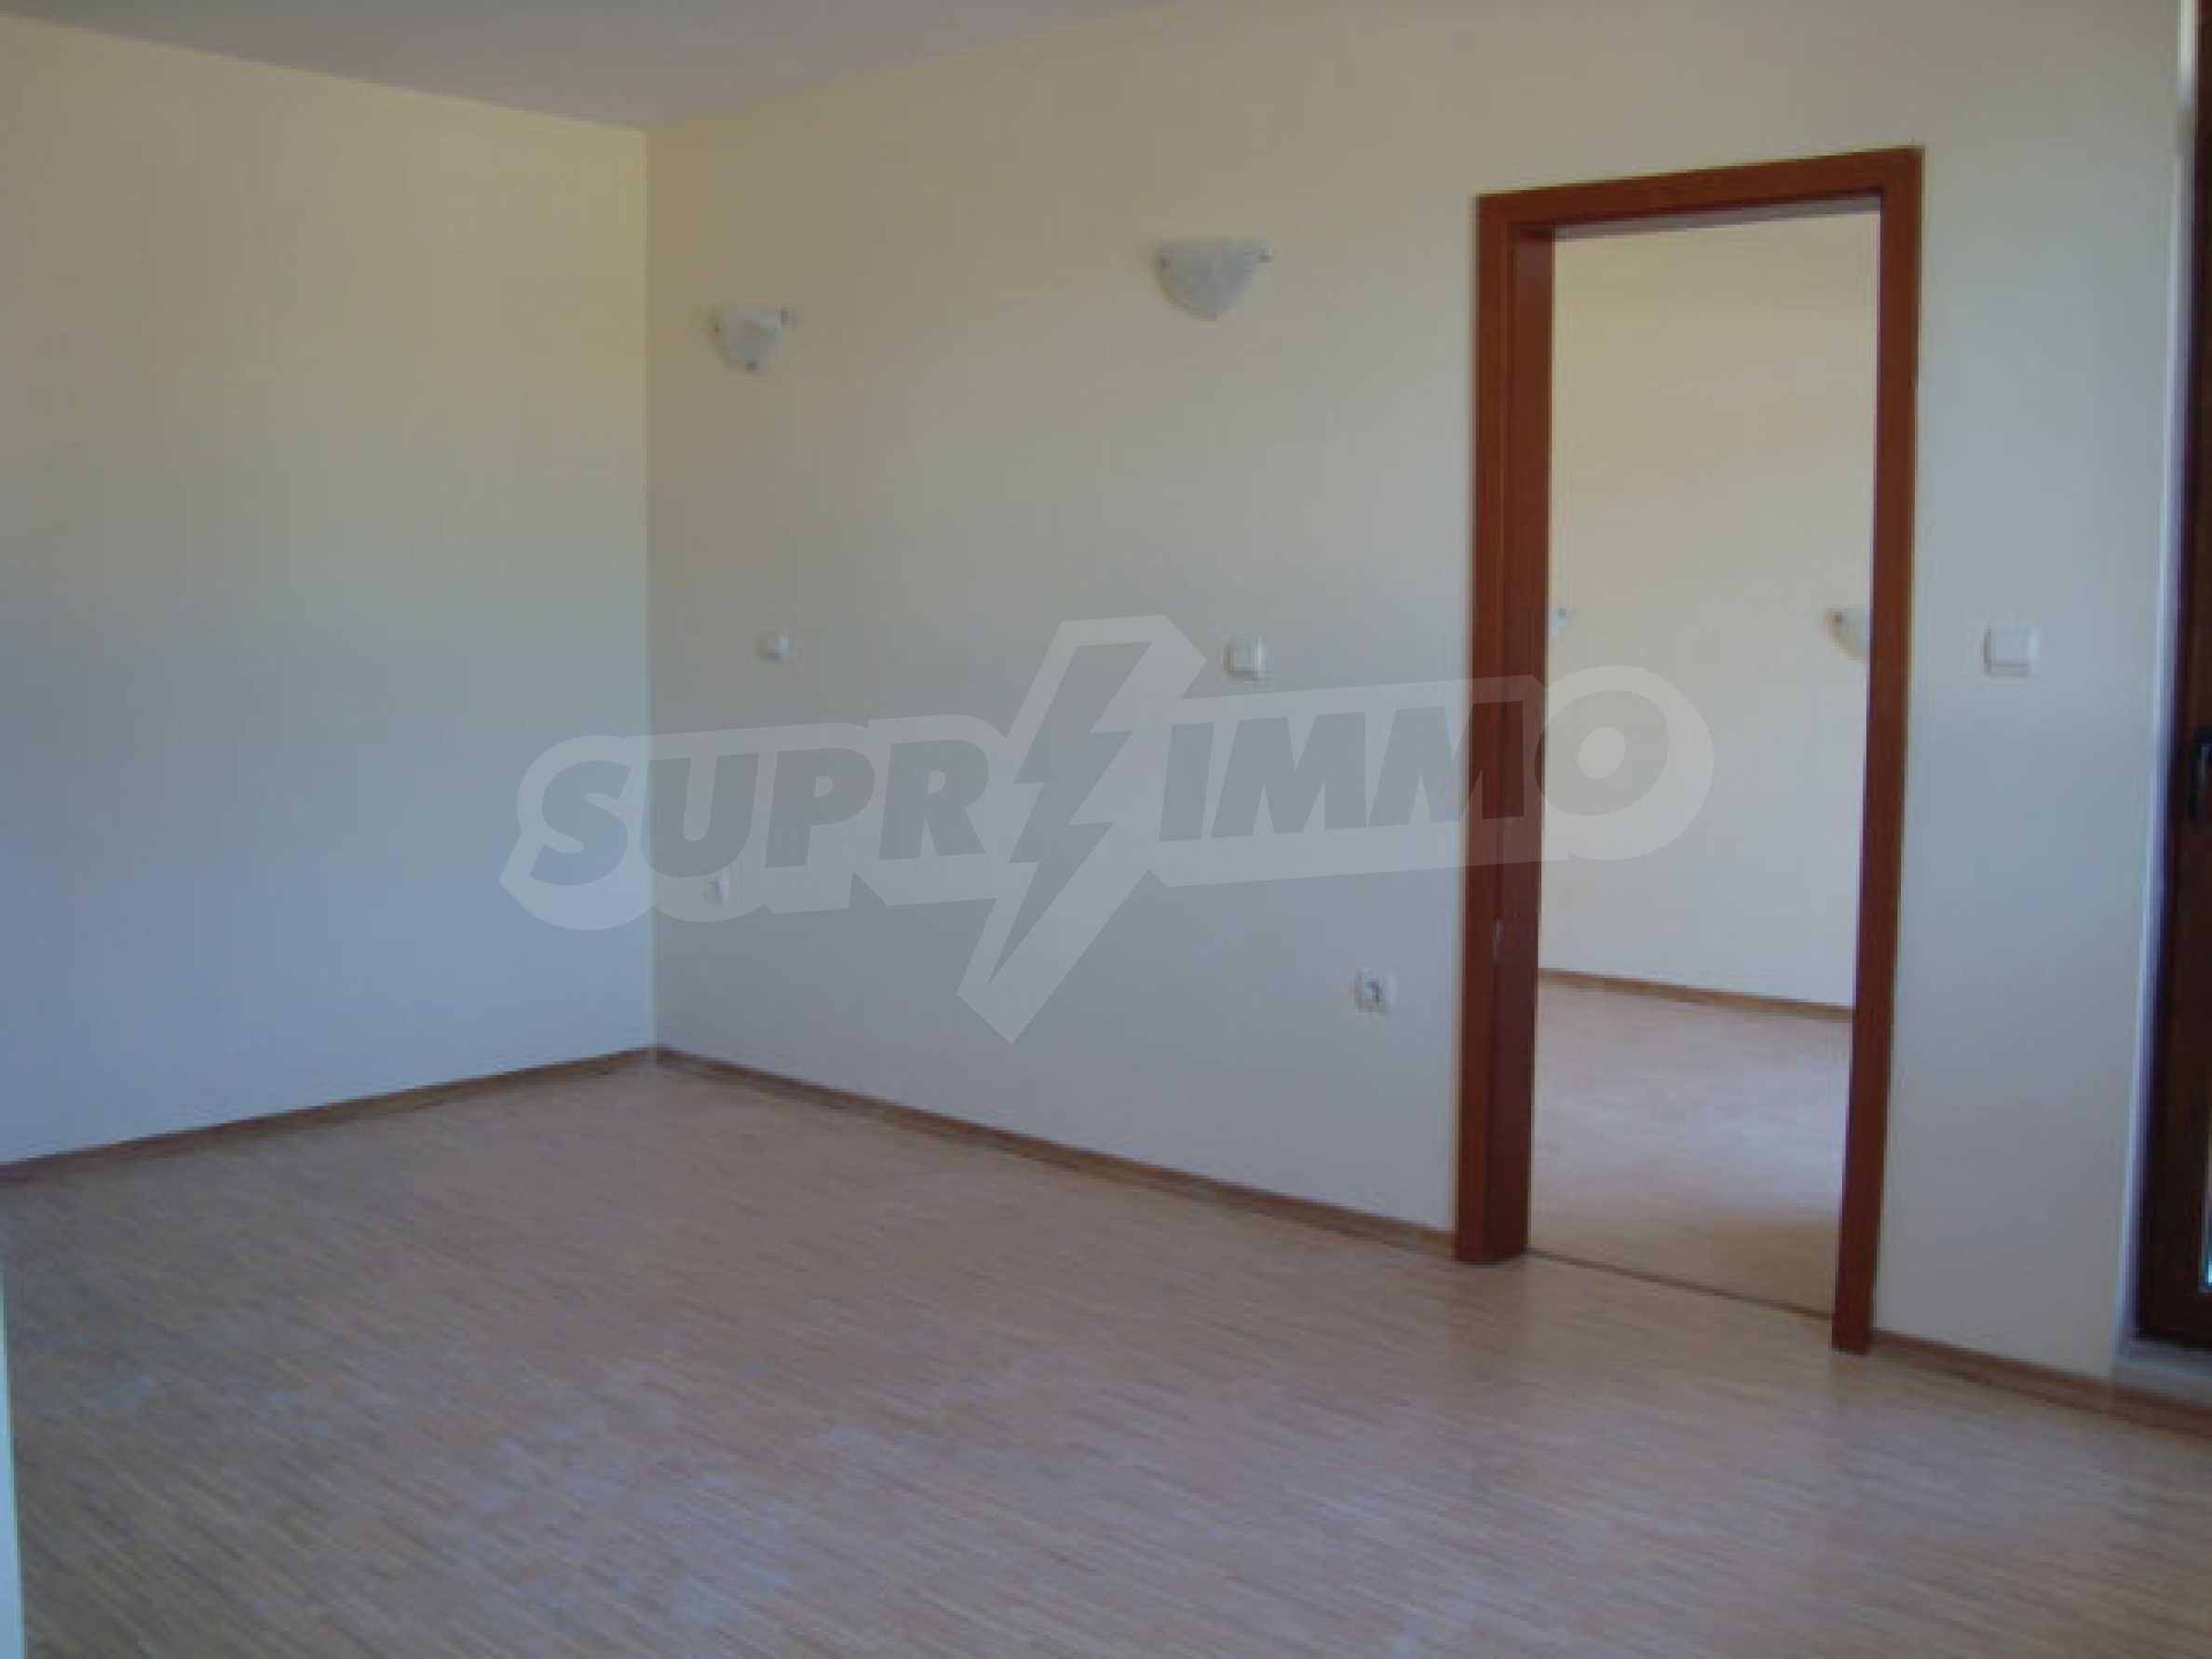 Studios und Apartments im Nestinarka-Komplex in Tsarevo 31